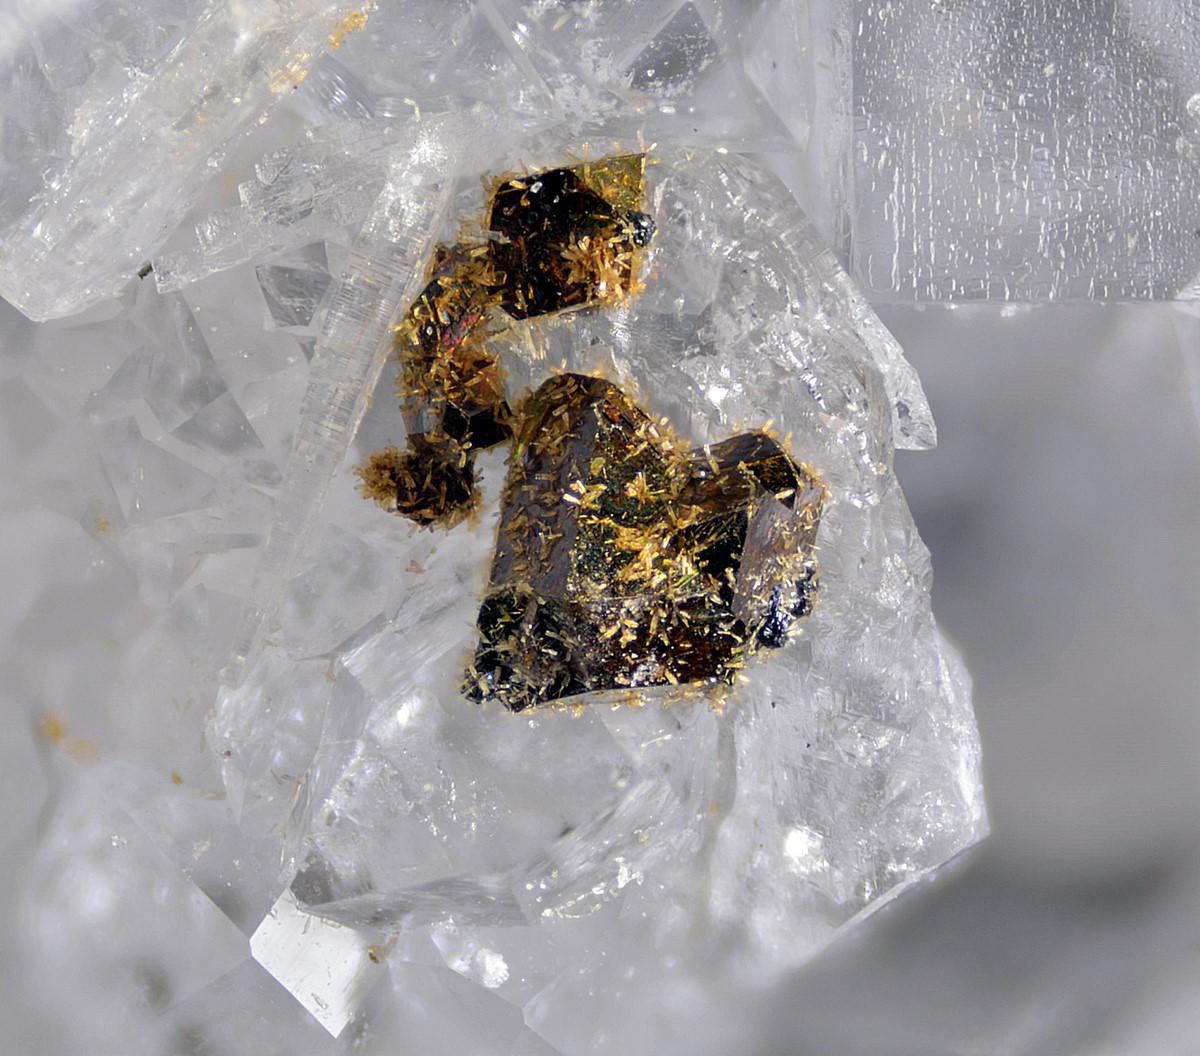 Rhabdophane-(Ce) & Chalcopyrite